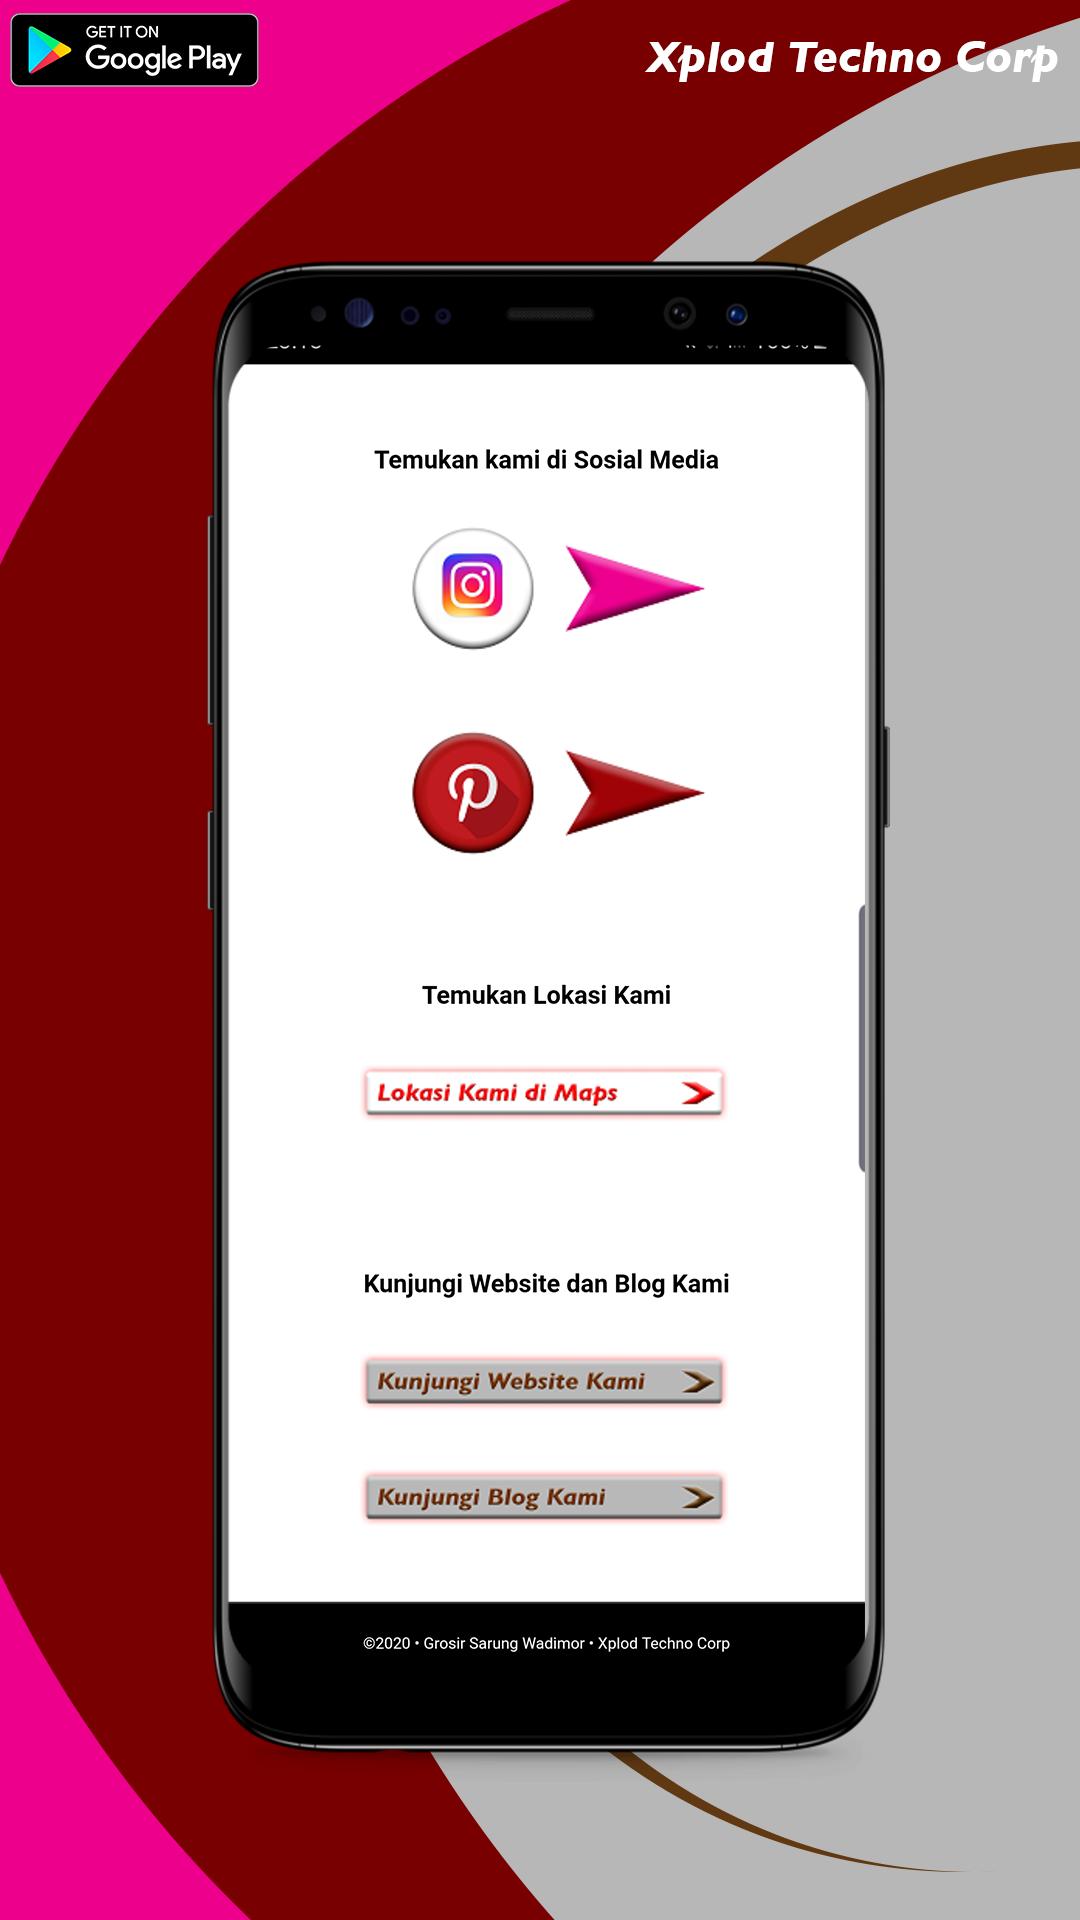 Aplikasi Grosir Sarung Wadimor Katalog Produk Sarung Wadimor Dari Developer Xplod Techno Corp Solo Aplikasi Smartphone Google Play